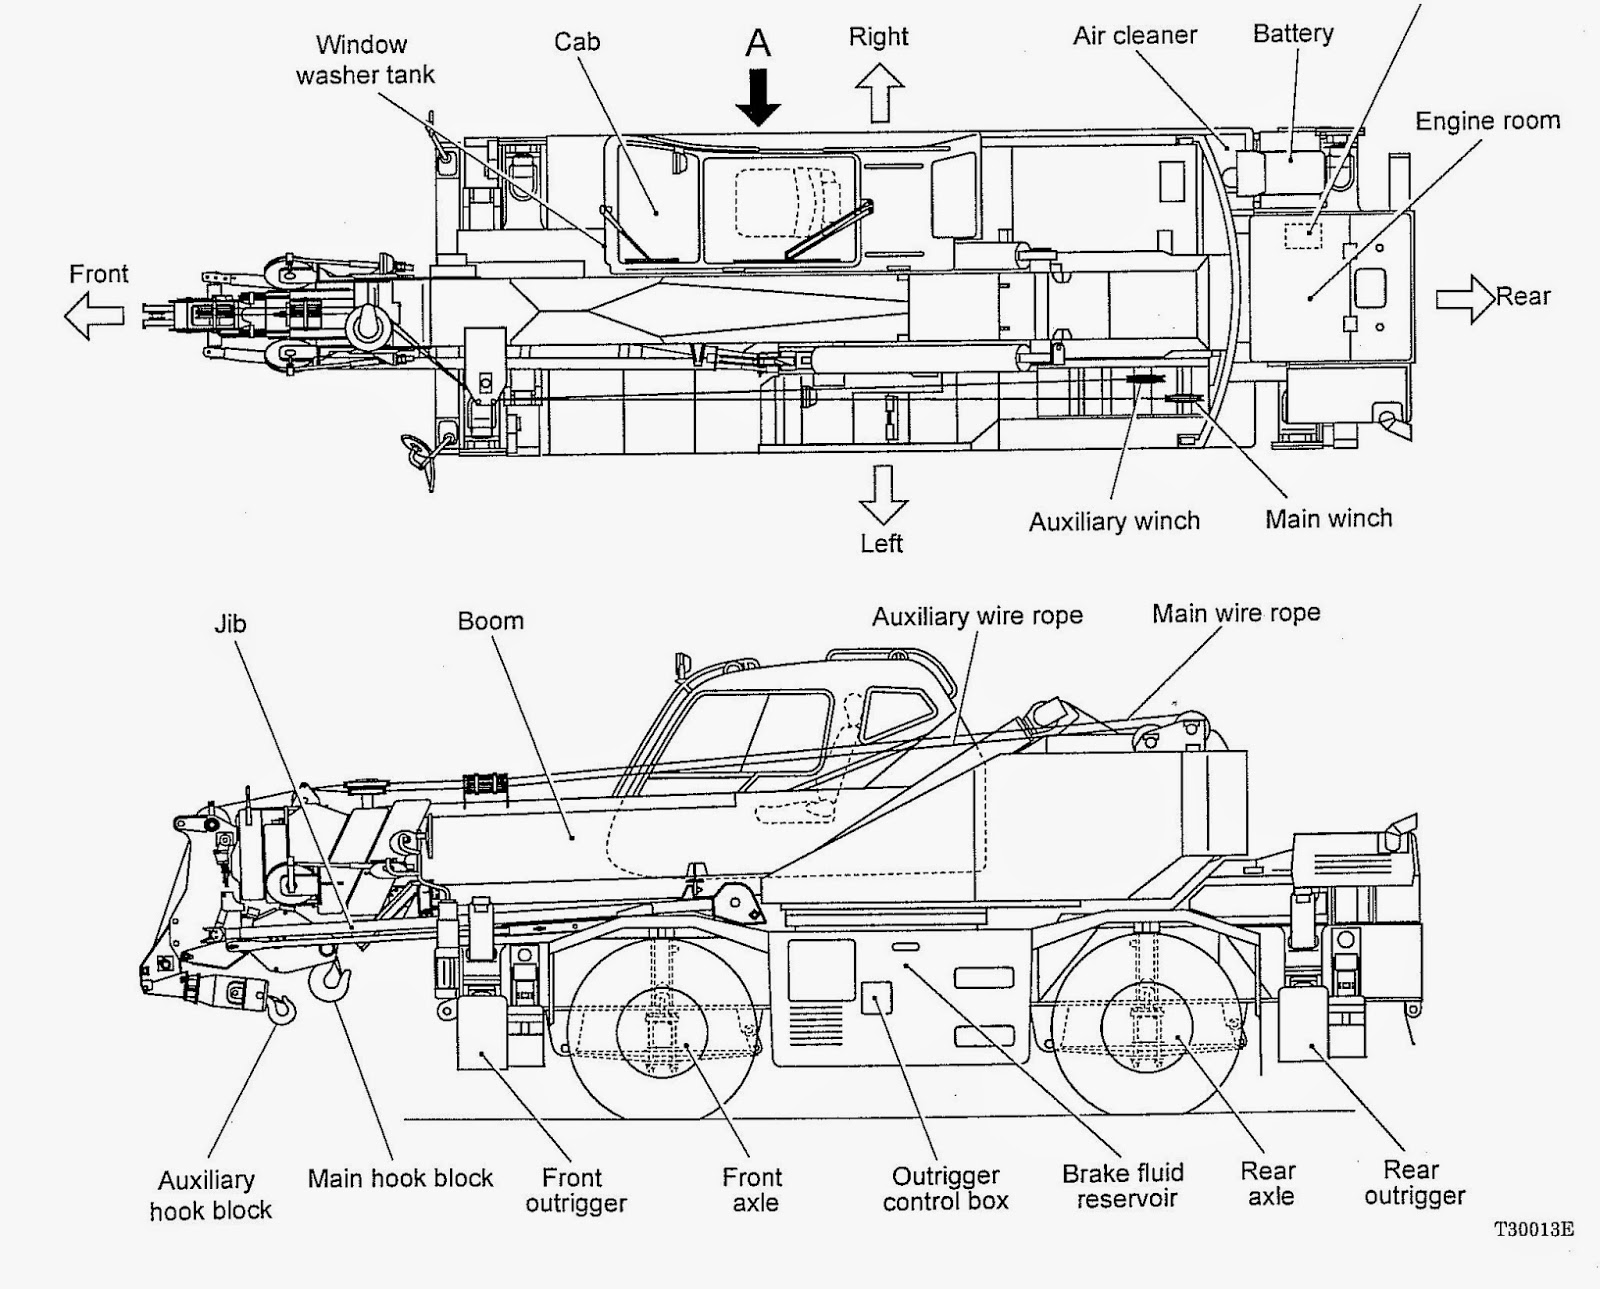 craneinfo.ru: TADANO Rough Terrain Crane model TR-160M-3